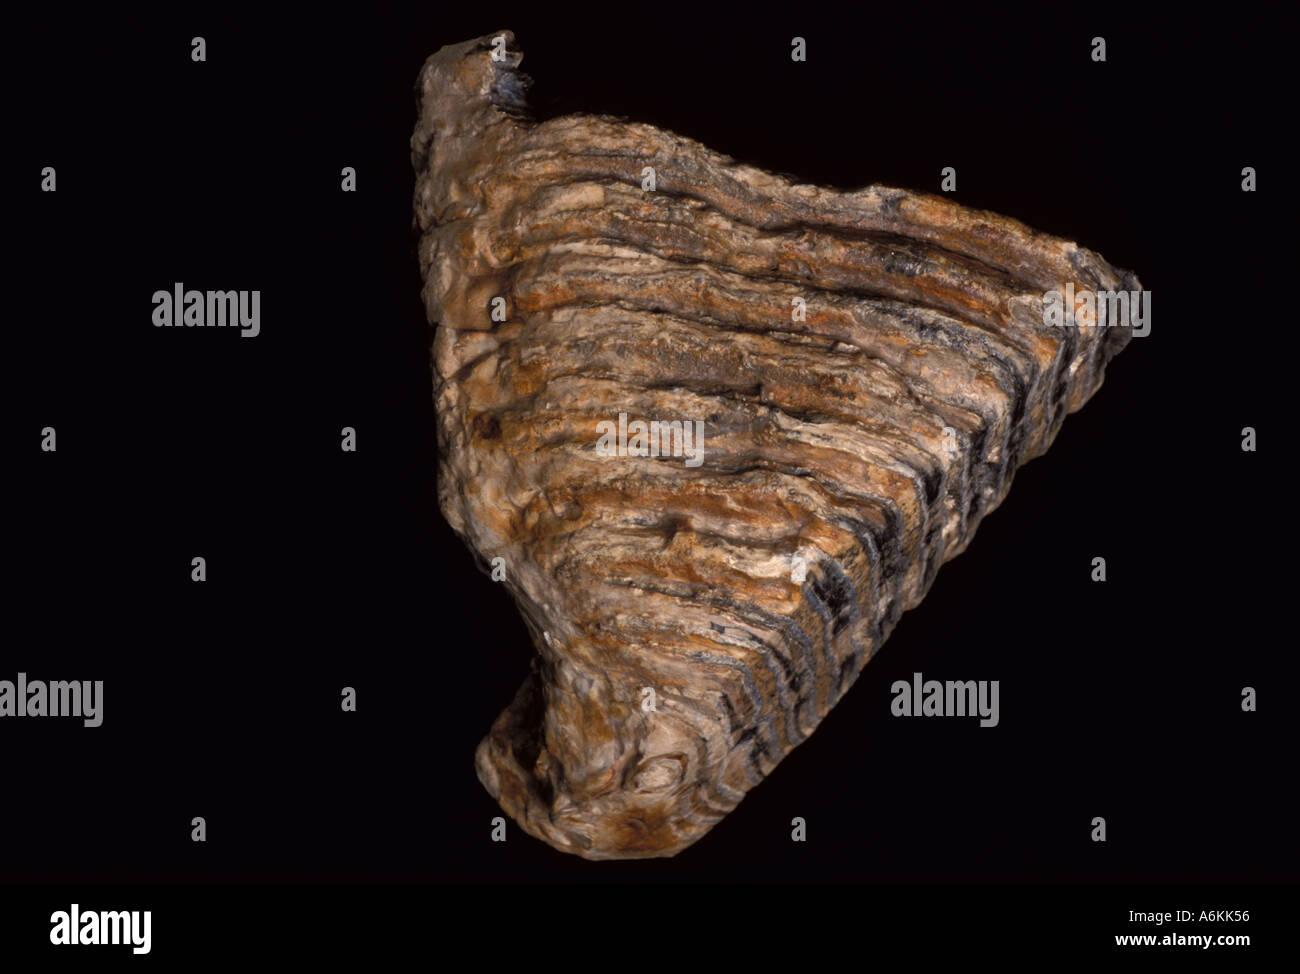 Mammuthus Tooth Fossil Miocene Pleistocene period time 10 Million Years Ago - Stock Image